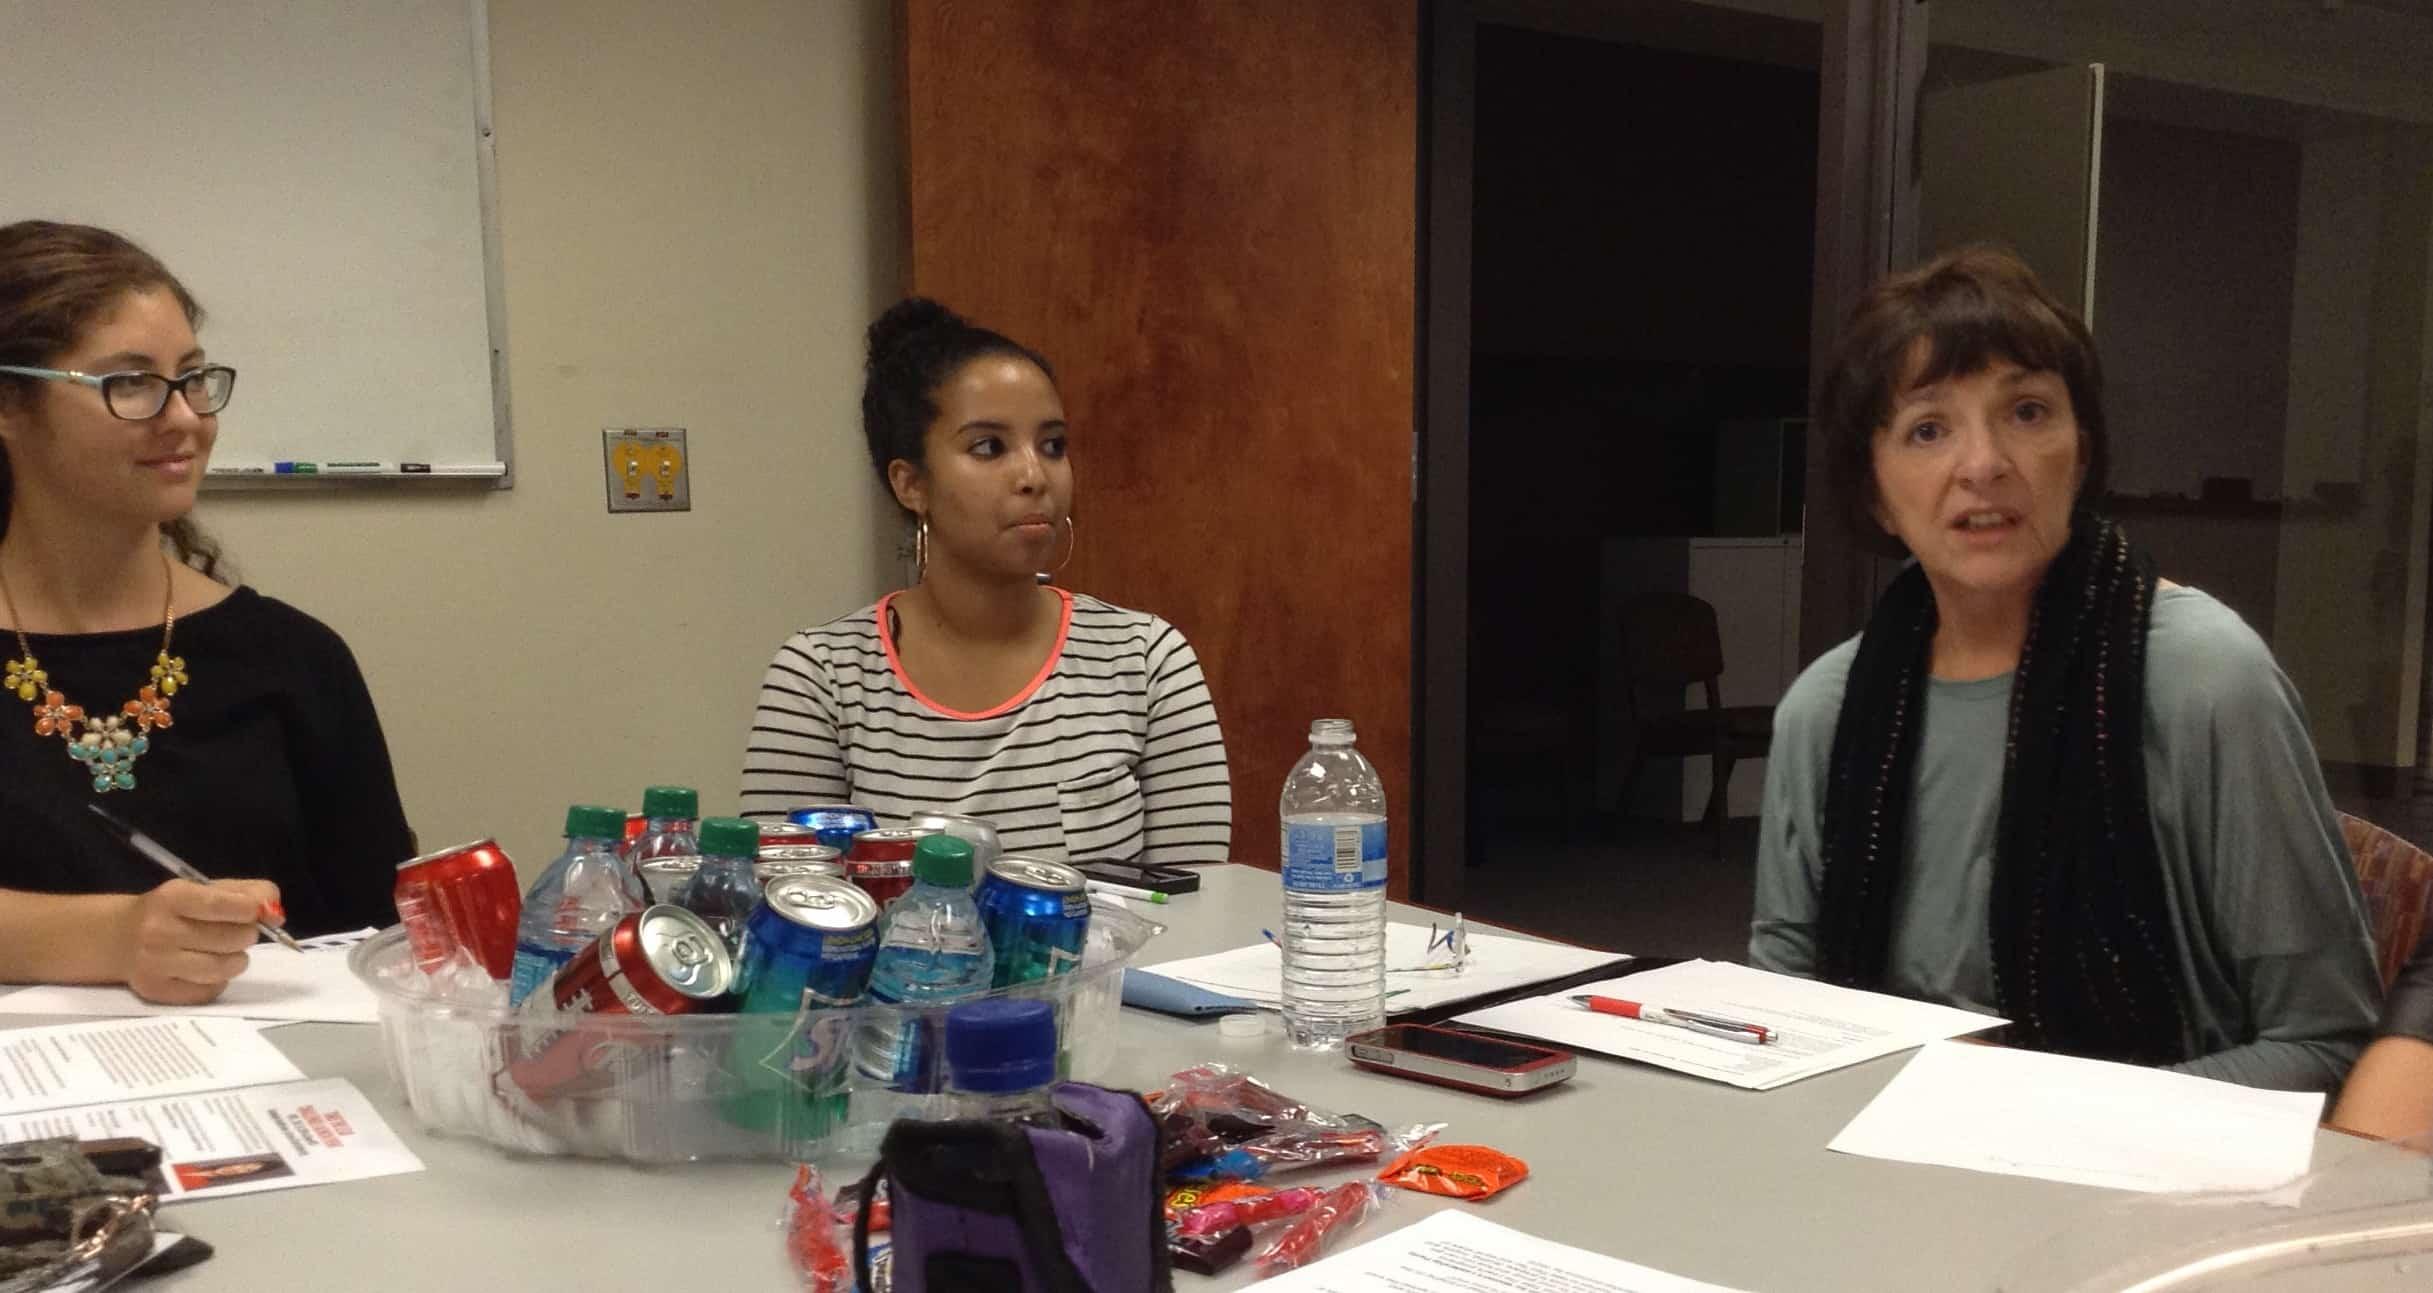 L-R: Lauren Sandground, Rhoda Hassan, Cheryl Swain meet to plan Take The Lead Challenge Feb. 19 launch